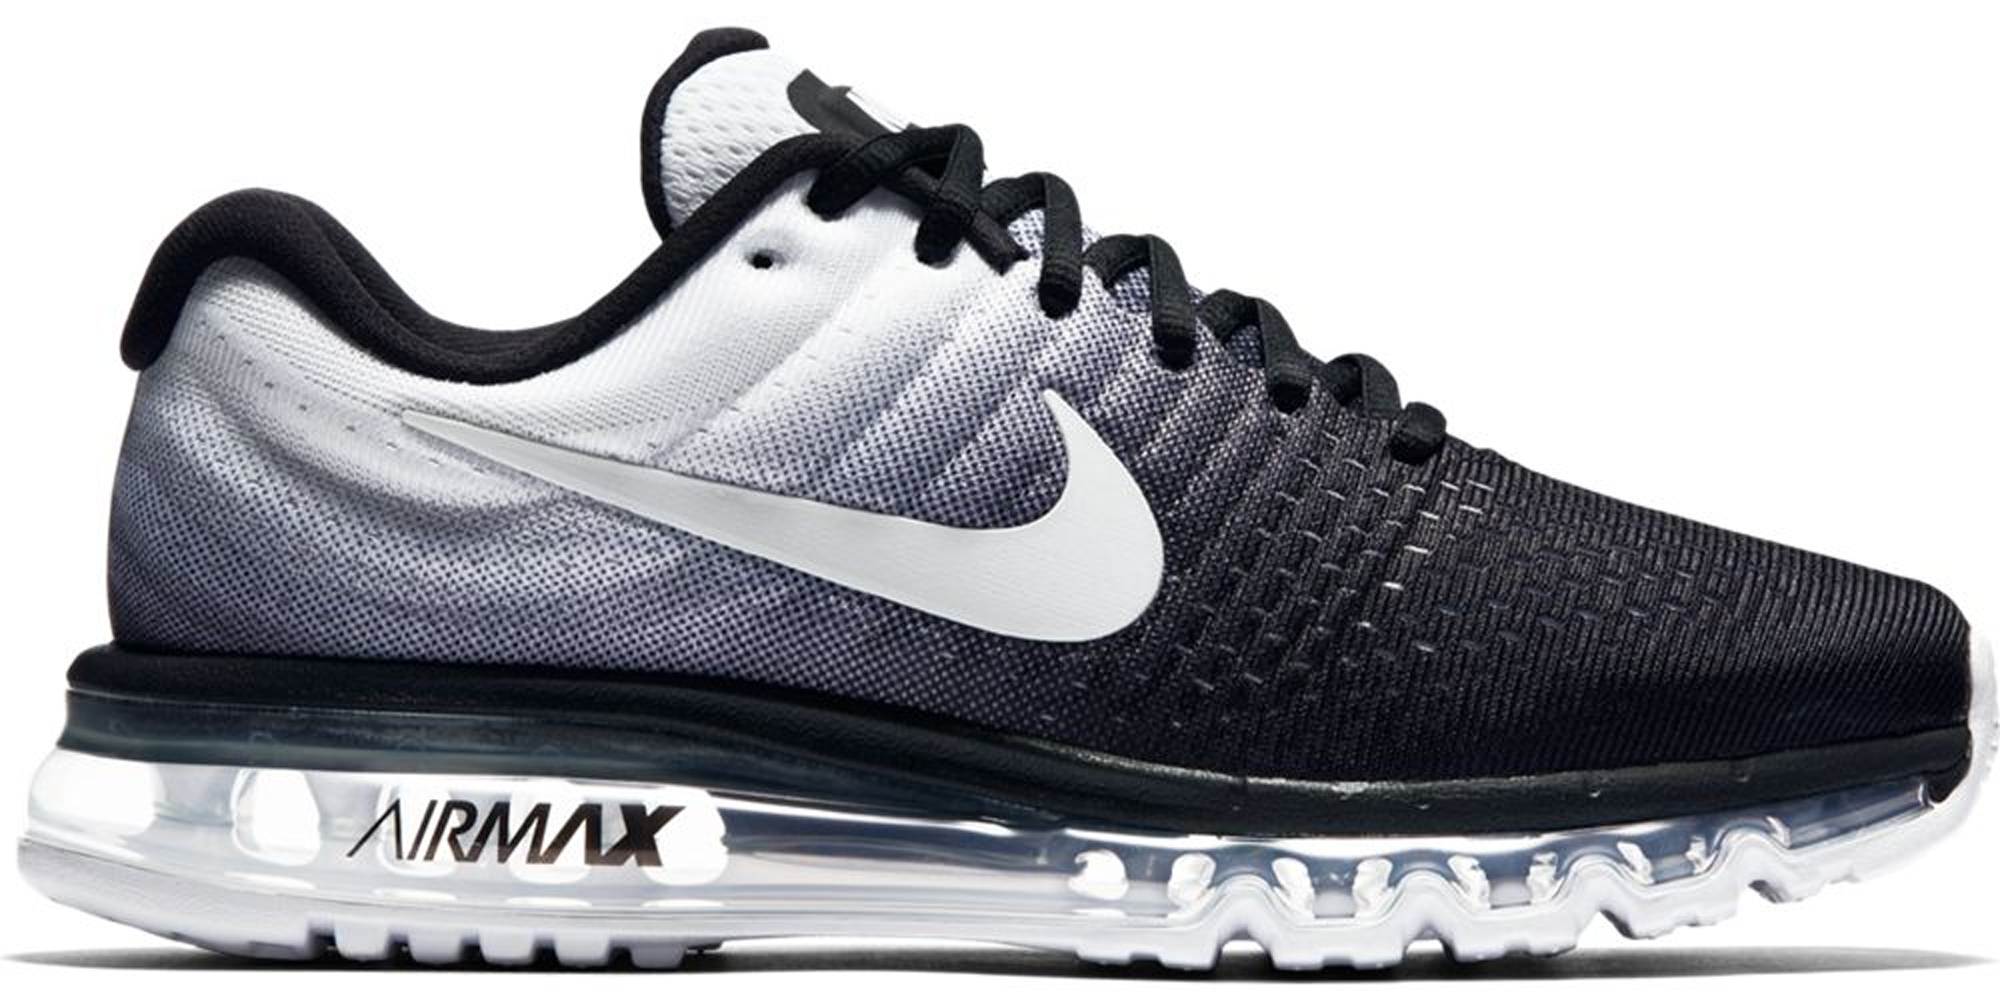 Nike Air Max 2017 Black White - 849559-010